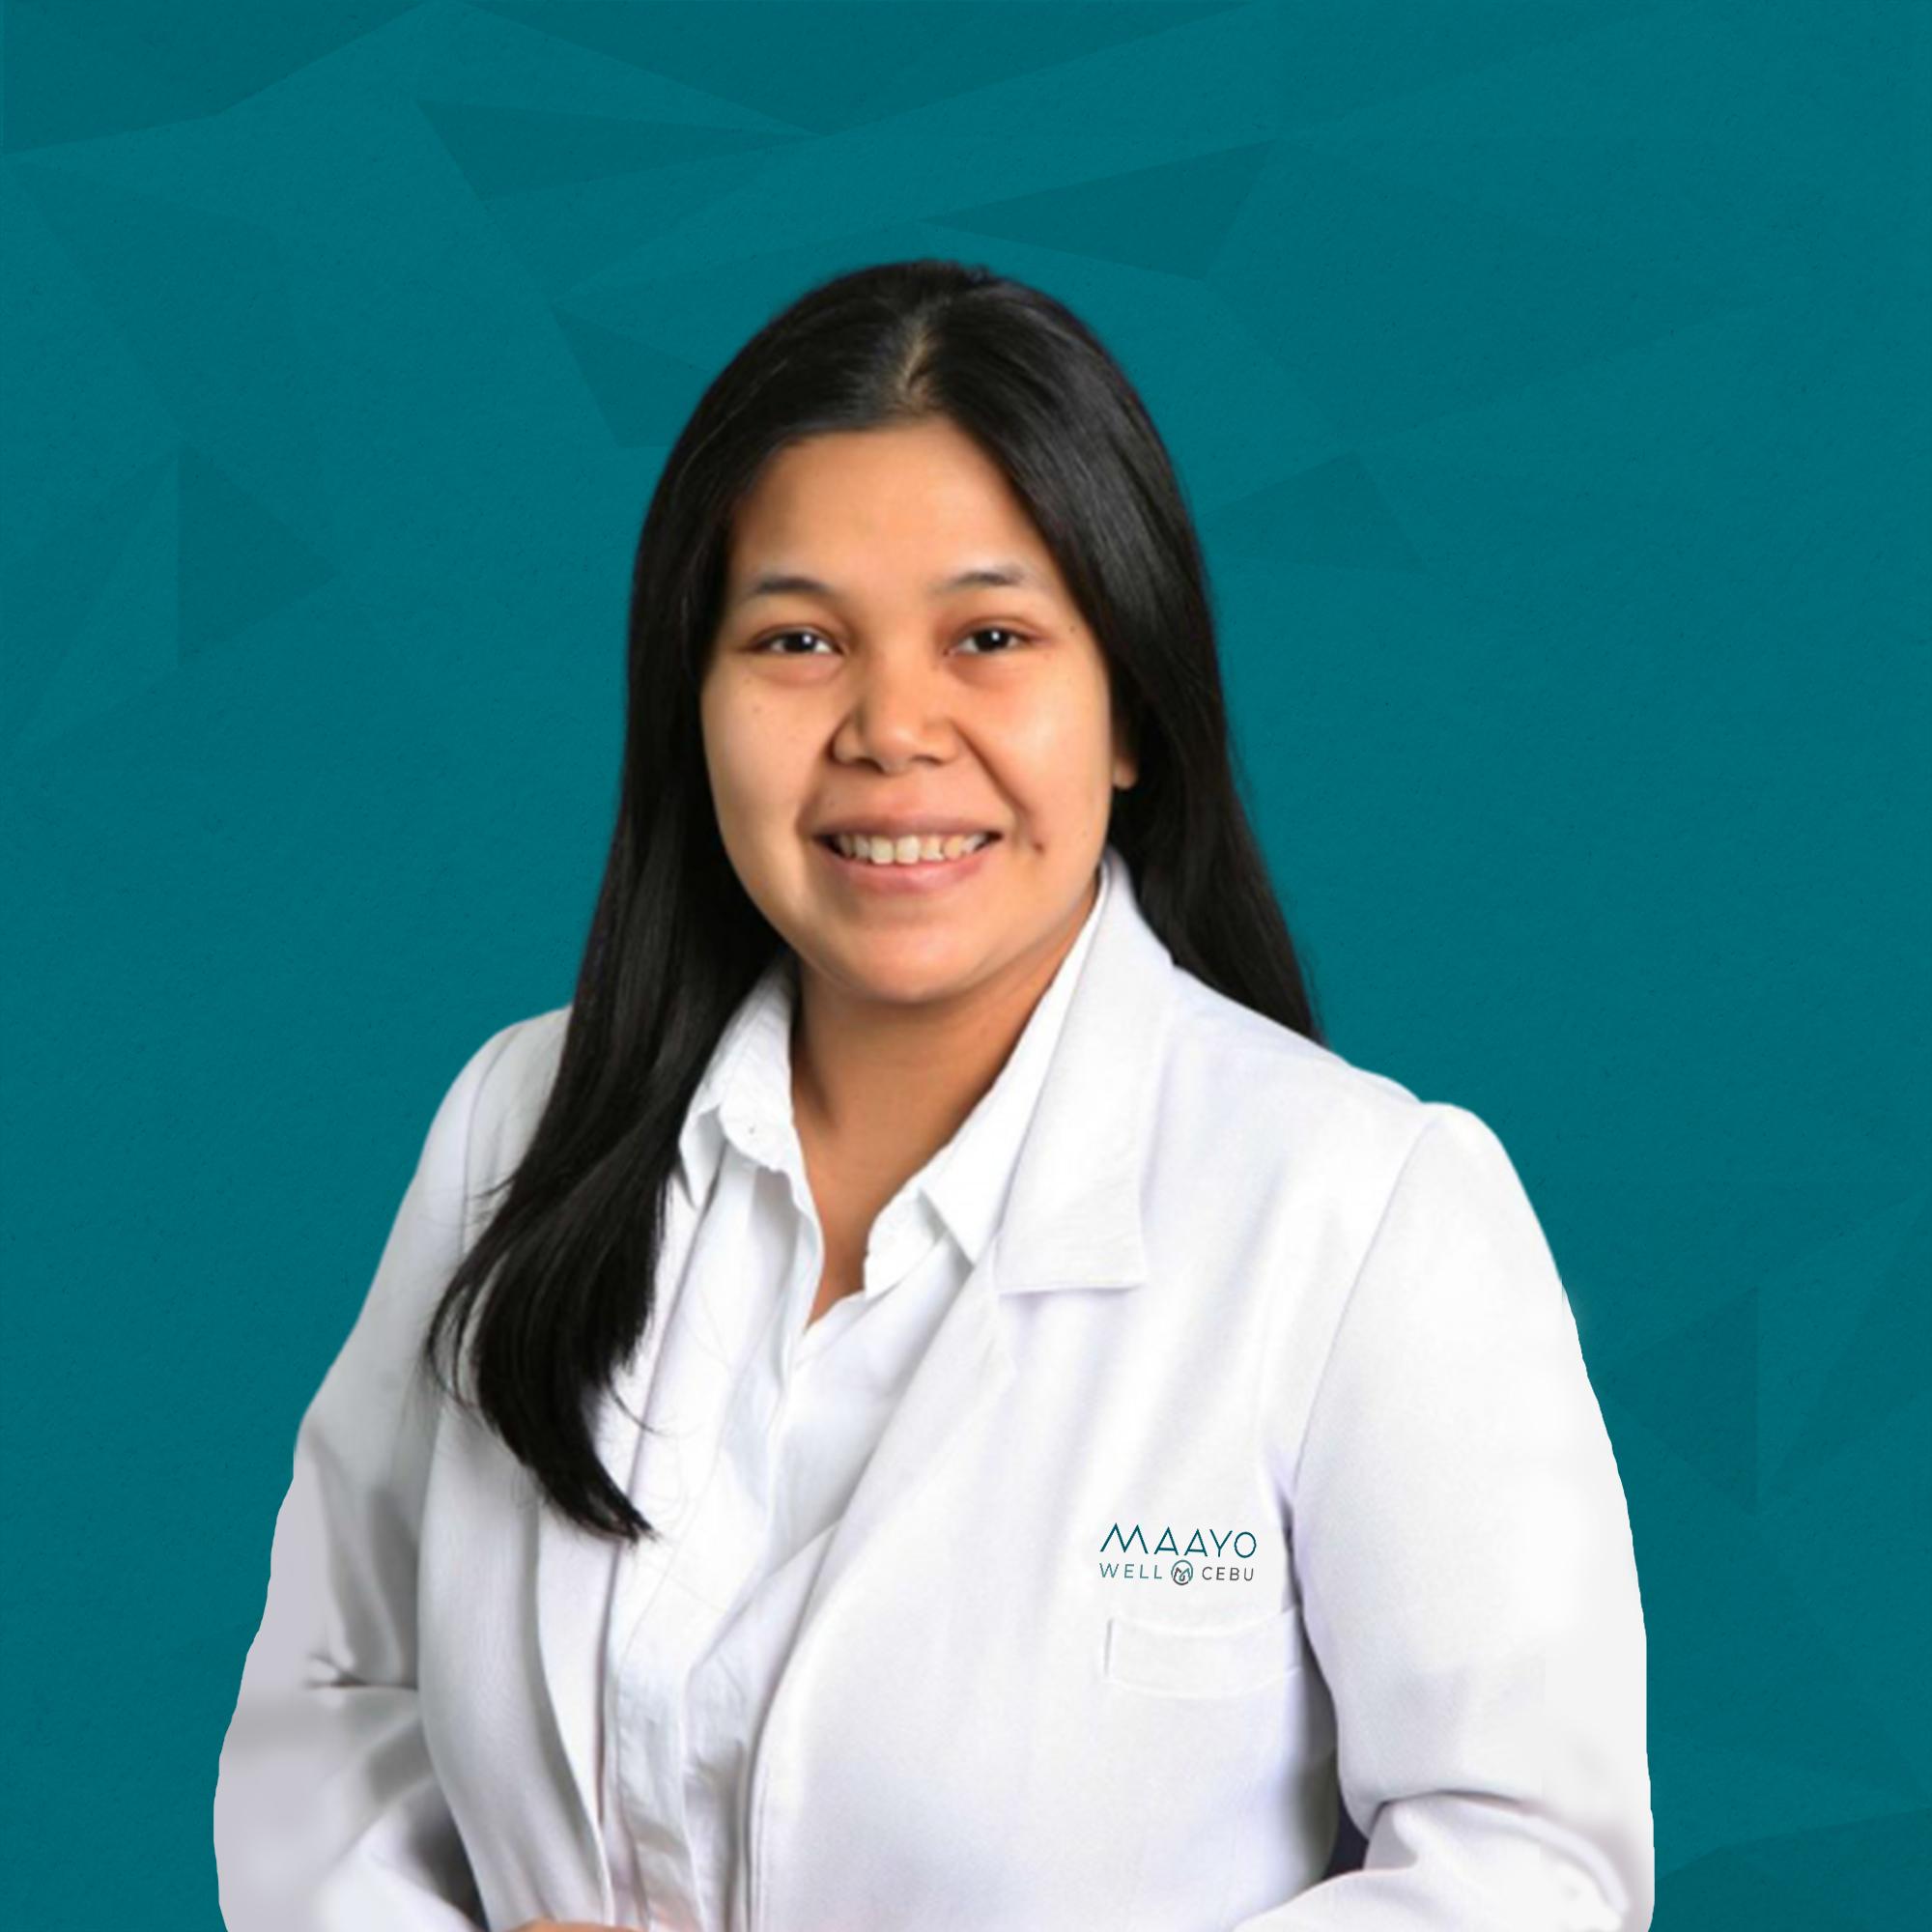 Dr. Arriola, Lyll Karen